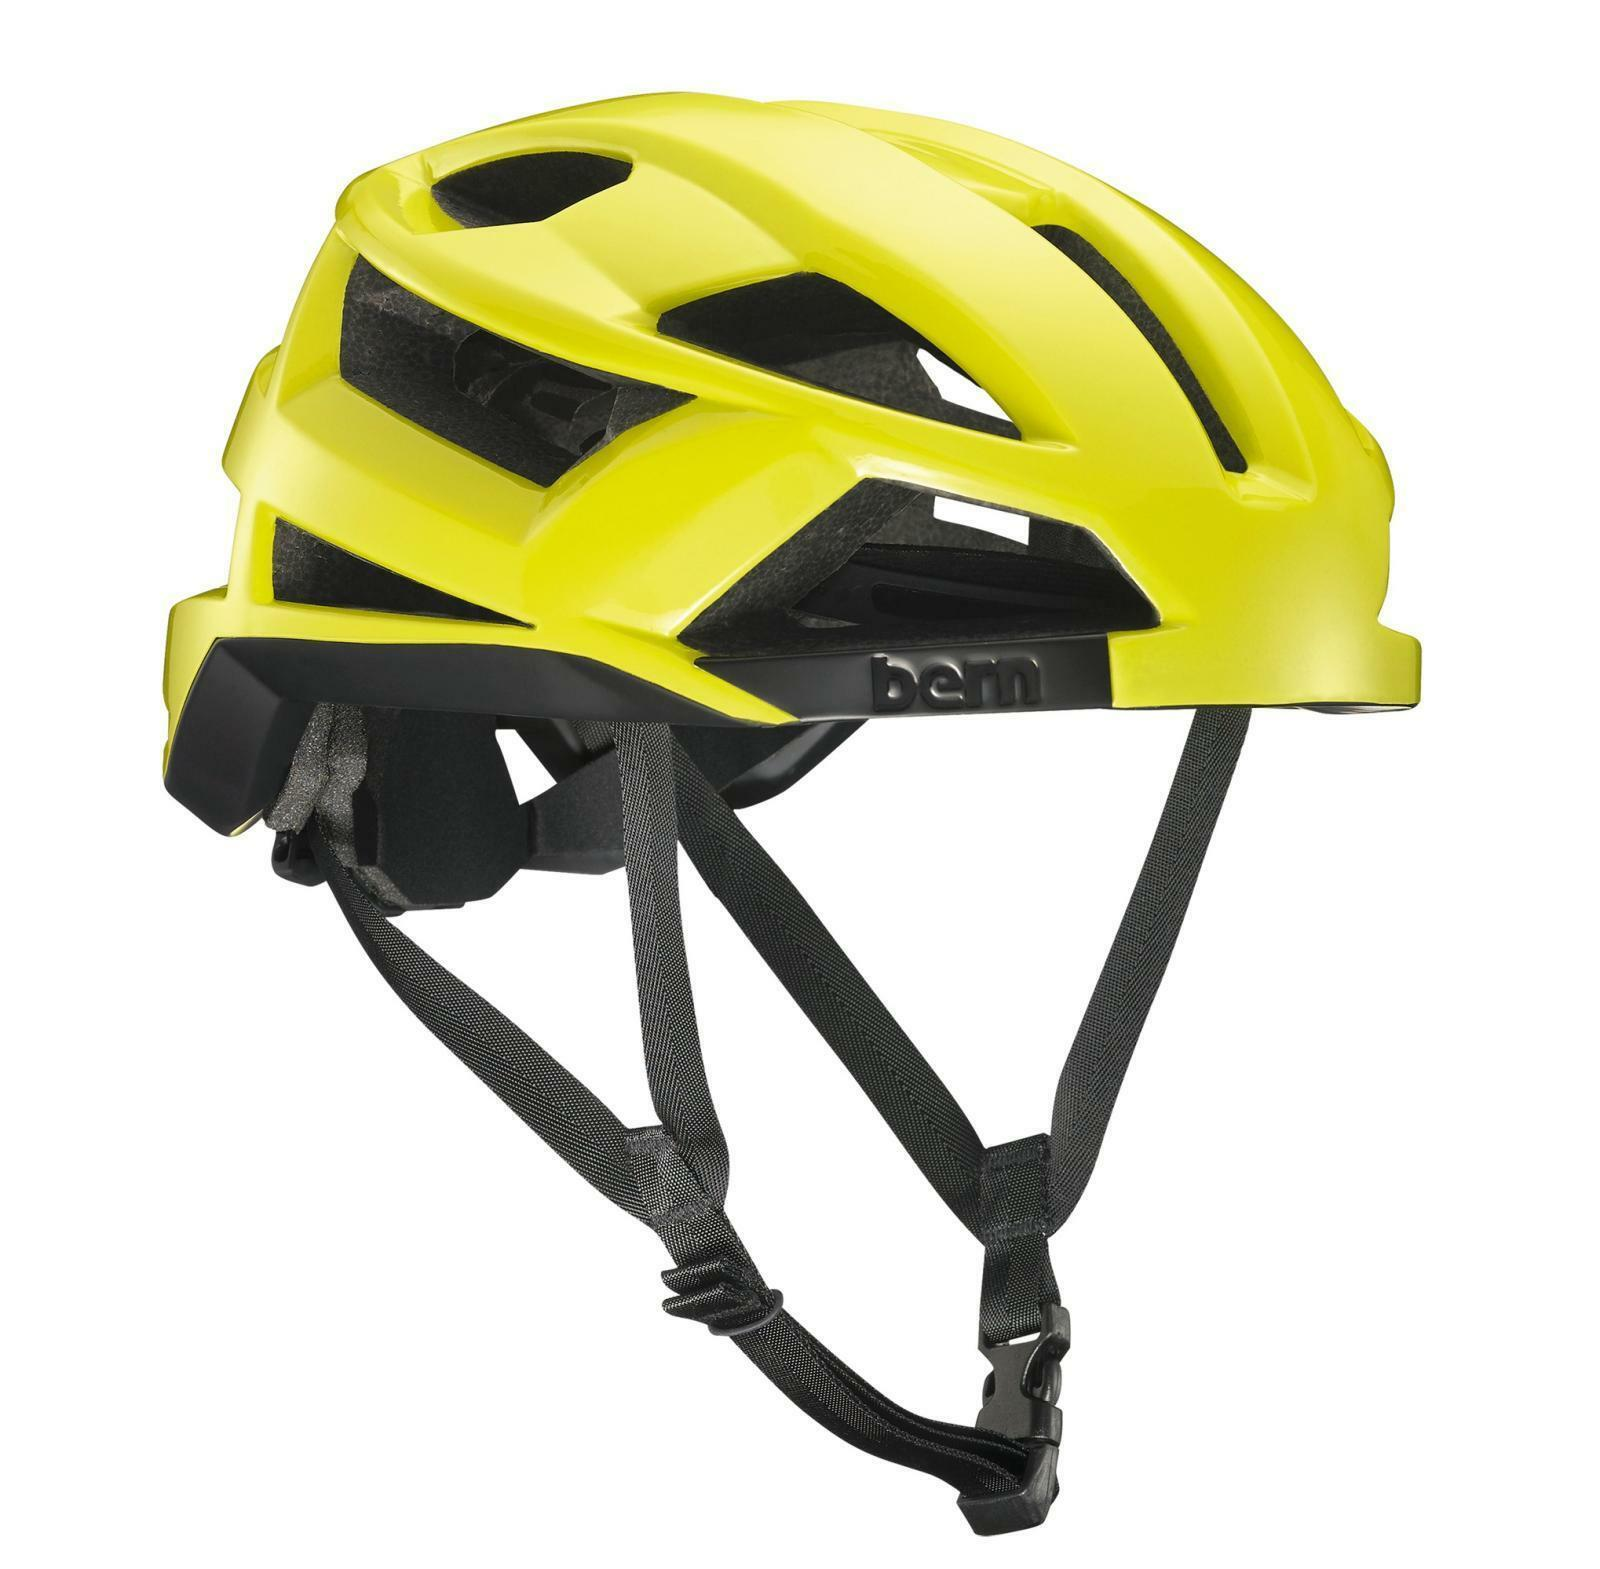 Bern Helm FL-1 Inmold Fahrrad Helm, Fahrradhelm  S  52-55,5cm, Neon yellow